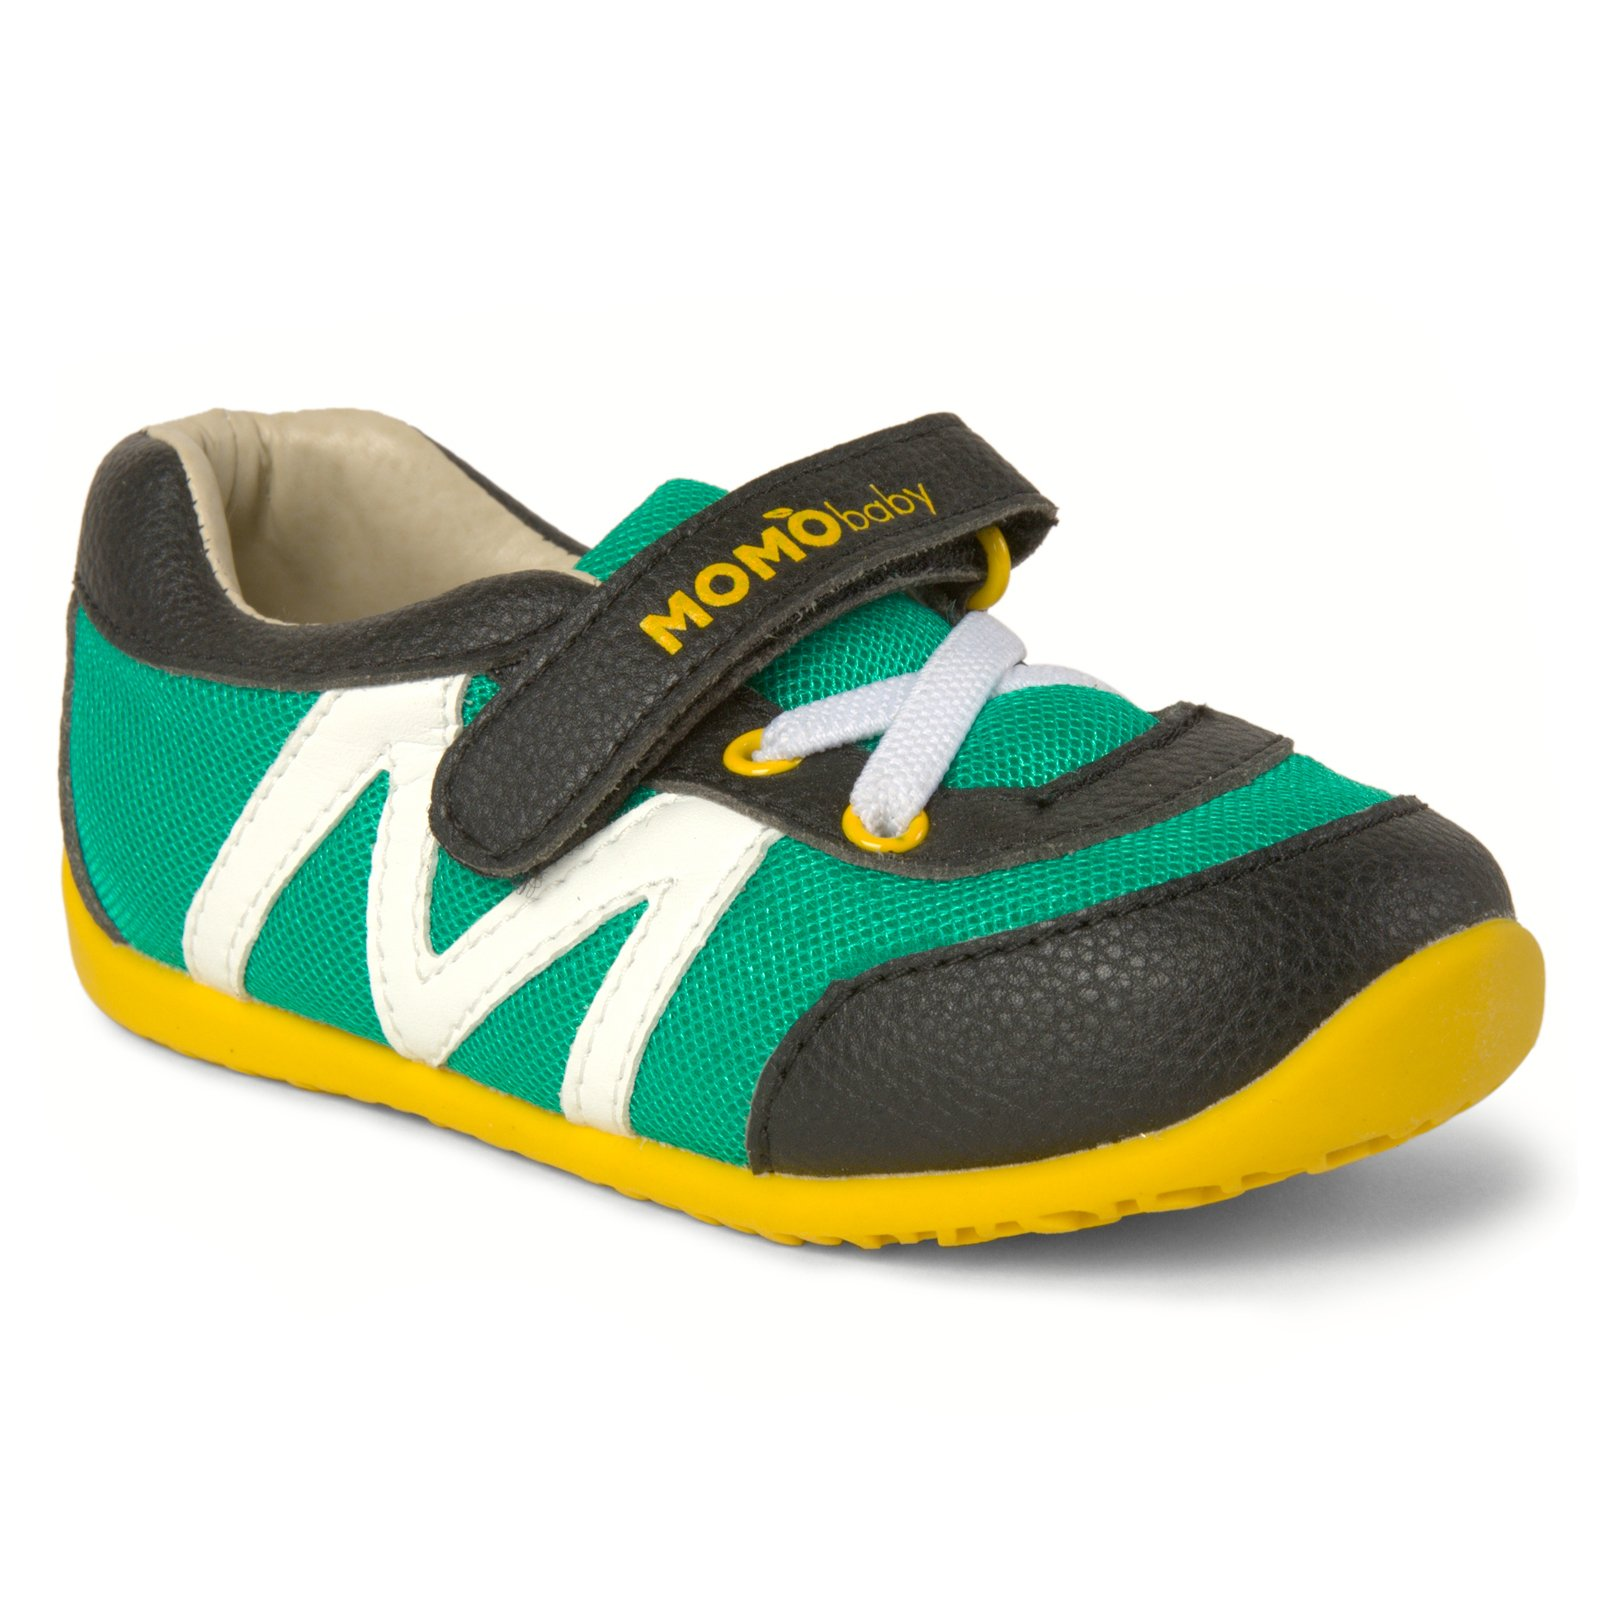 Momo Baby Boys First Walker/Toddler Hunter Sneaker Shoes - 6 M US Toddler